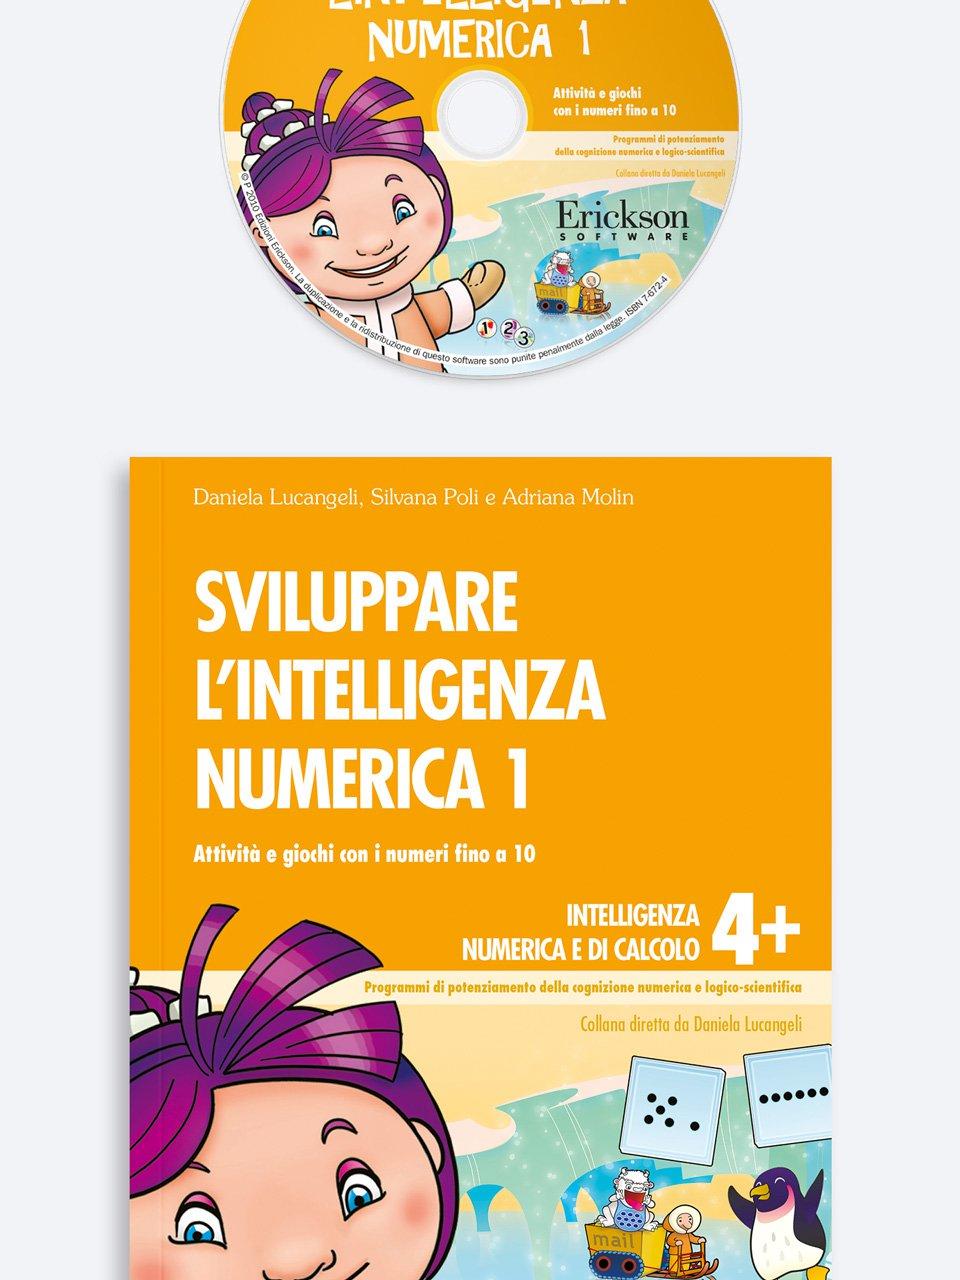 Sviluppare l'intelligenza numerica 1 - Daniela Lucangeli - Erickson